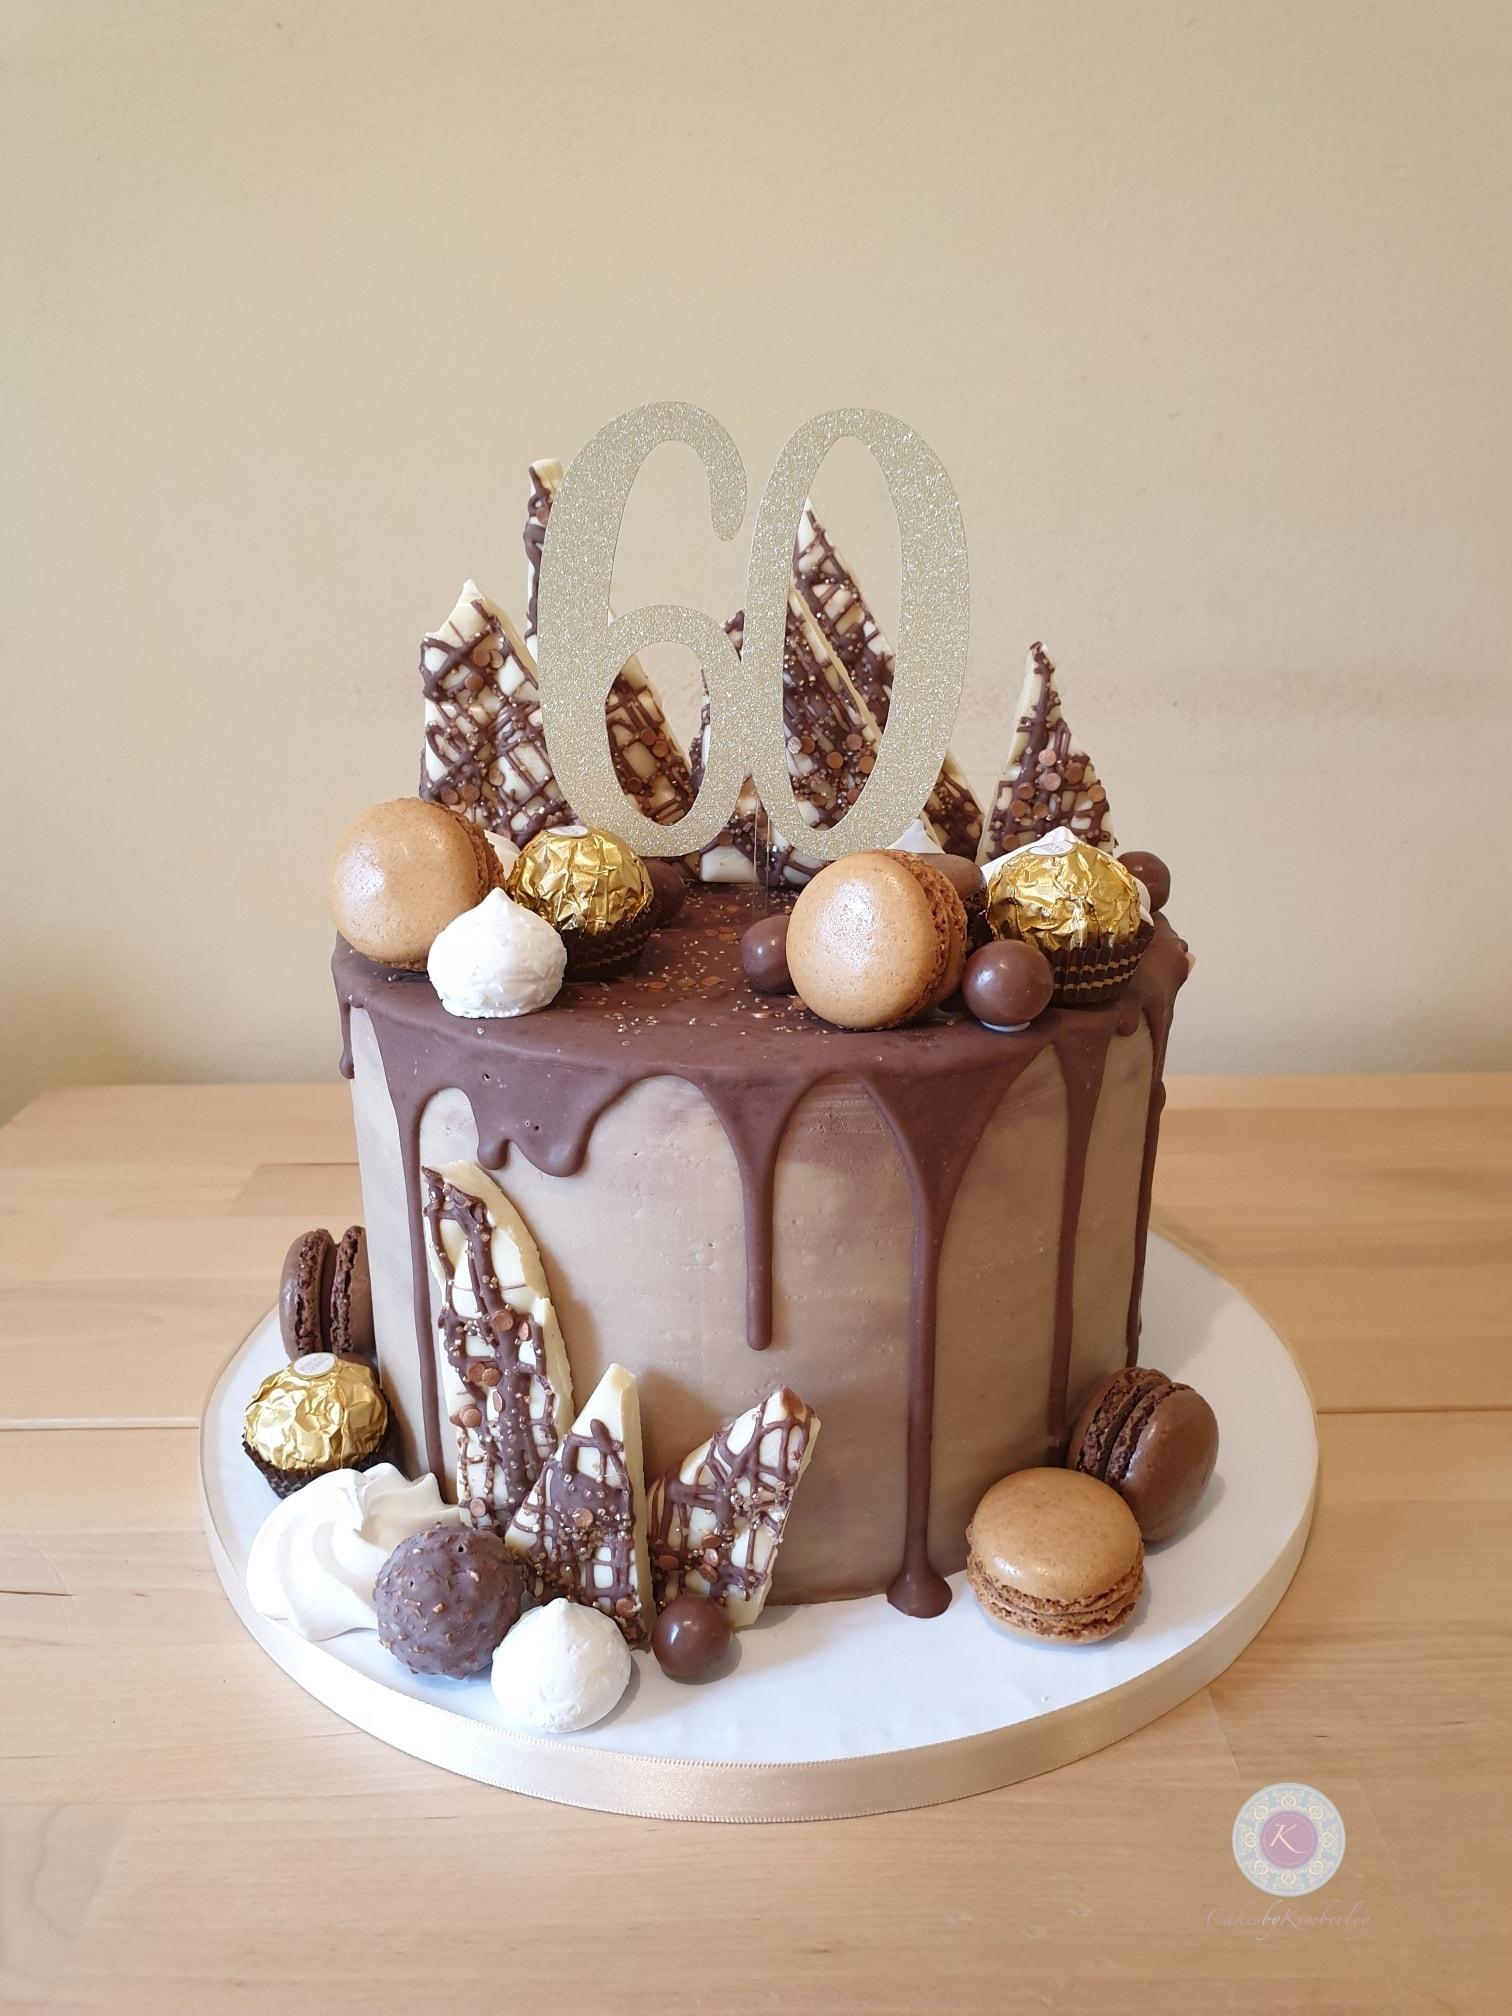 Drip cake - Cathy 60th